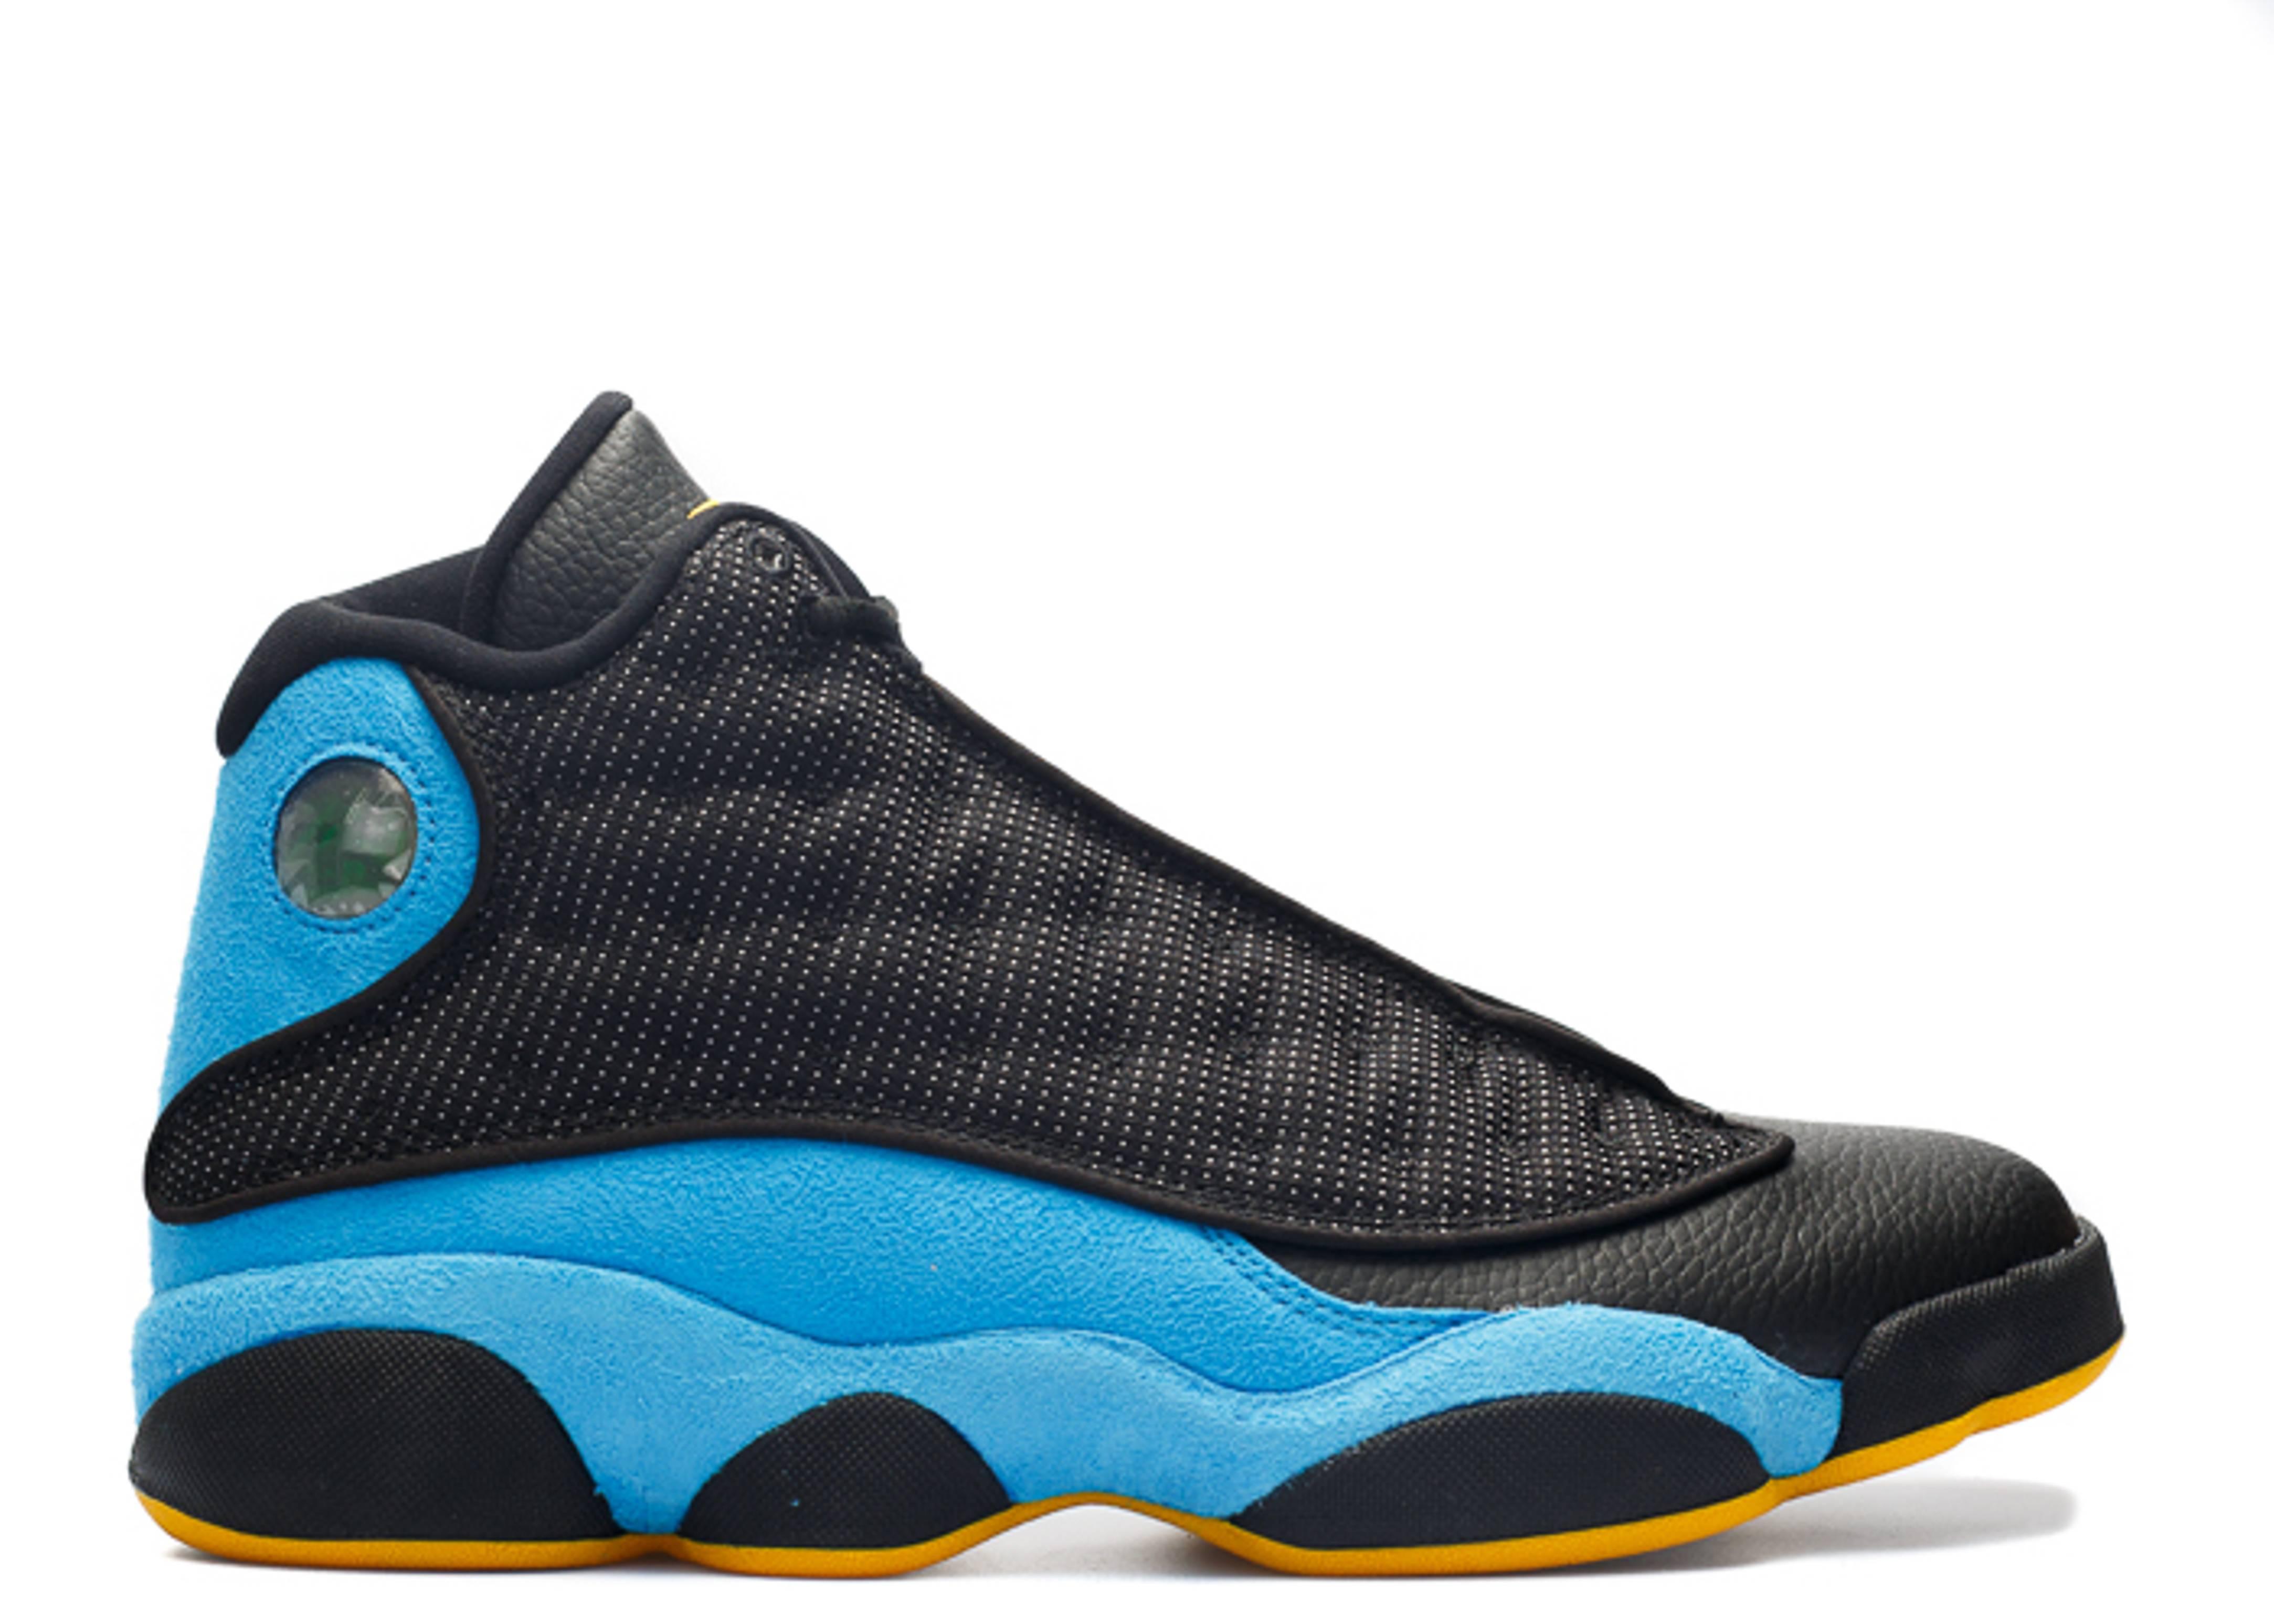 Air Jordan 13 (XIII) Shoes - Nike  6eb7b1cc8